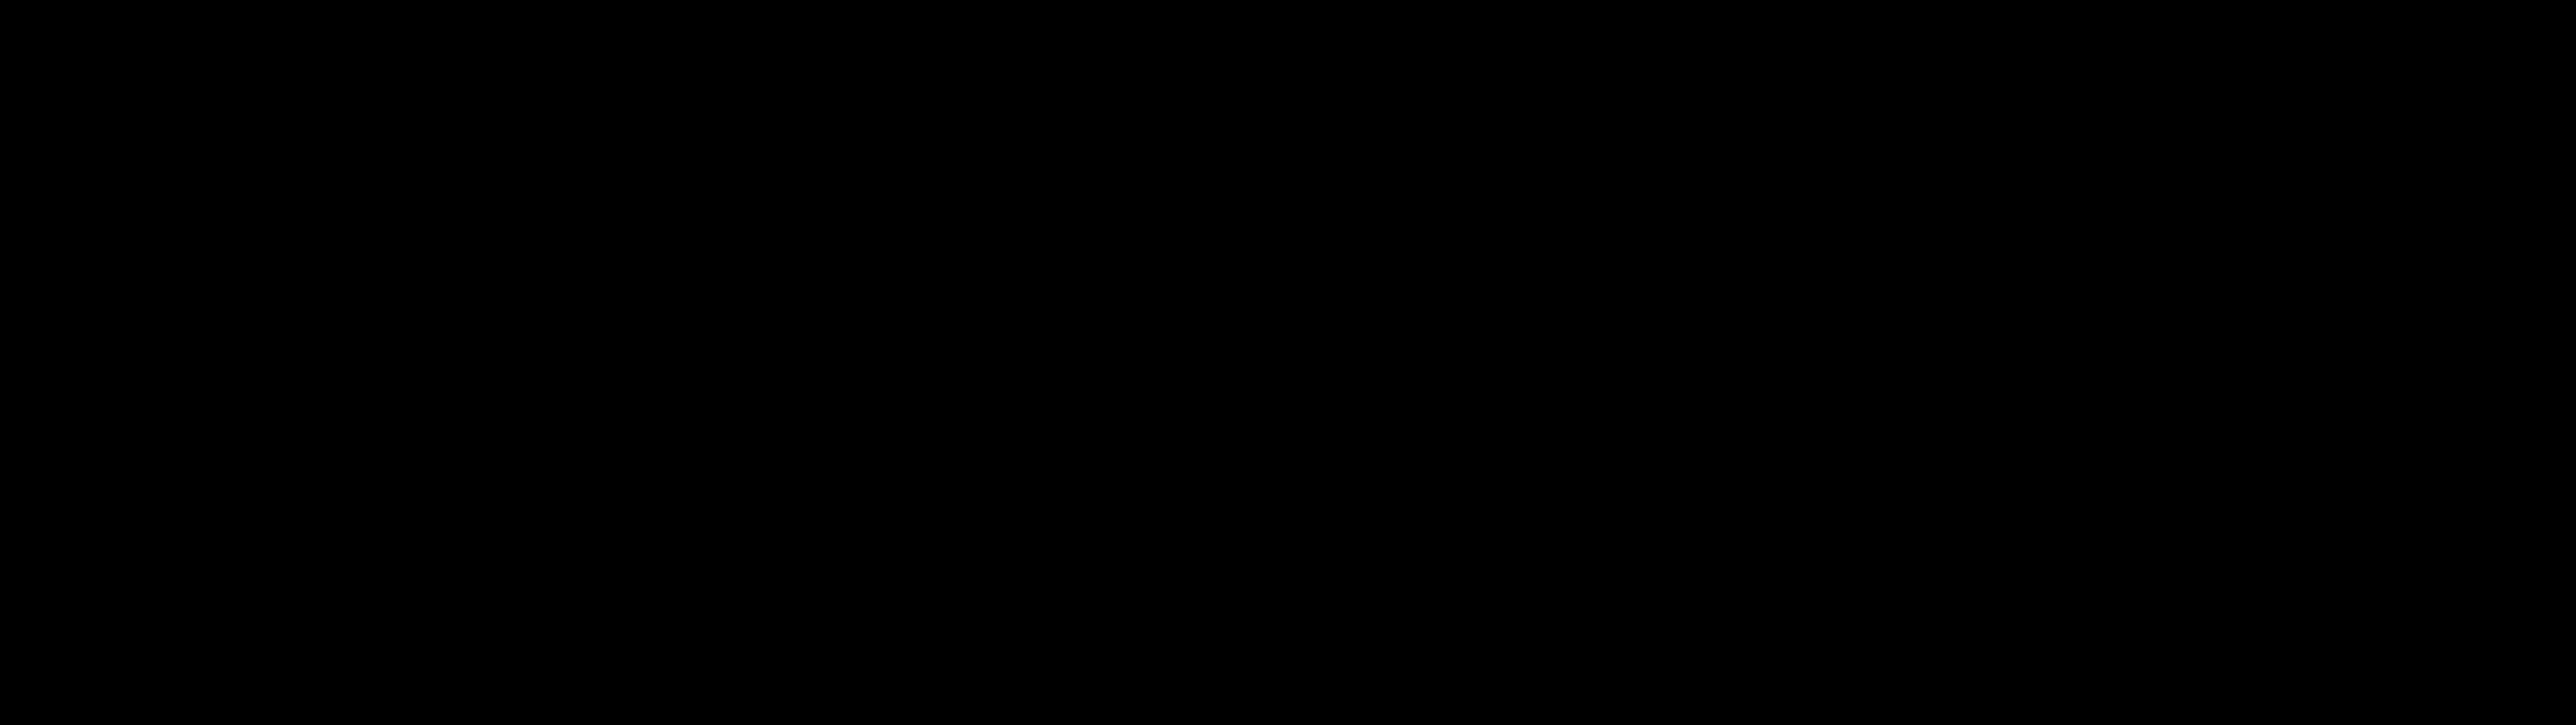 Variant – Commercial Trailer – 3018 P4 (561x180x93 cm)